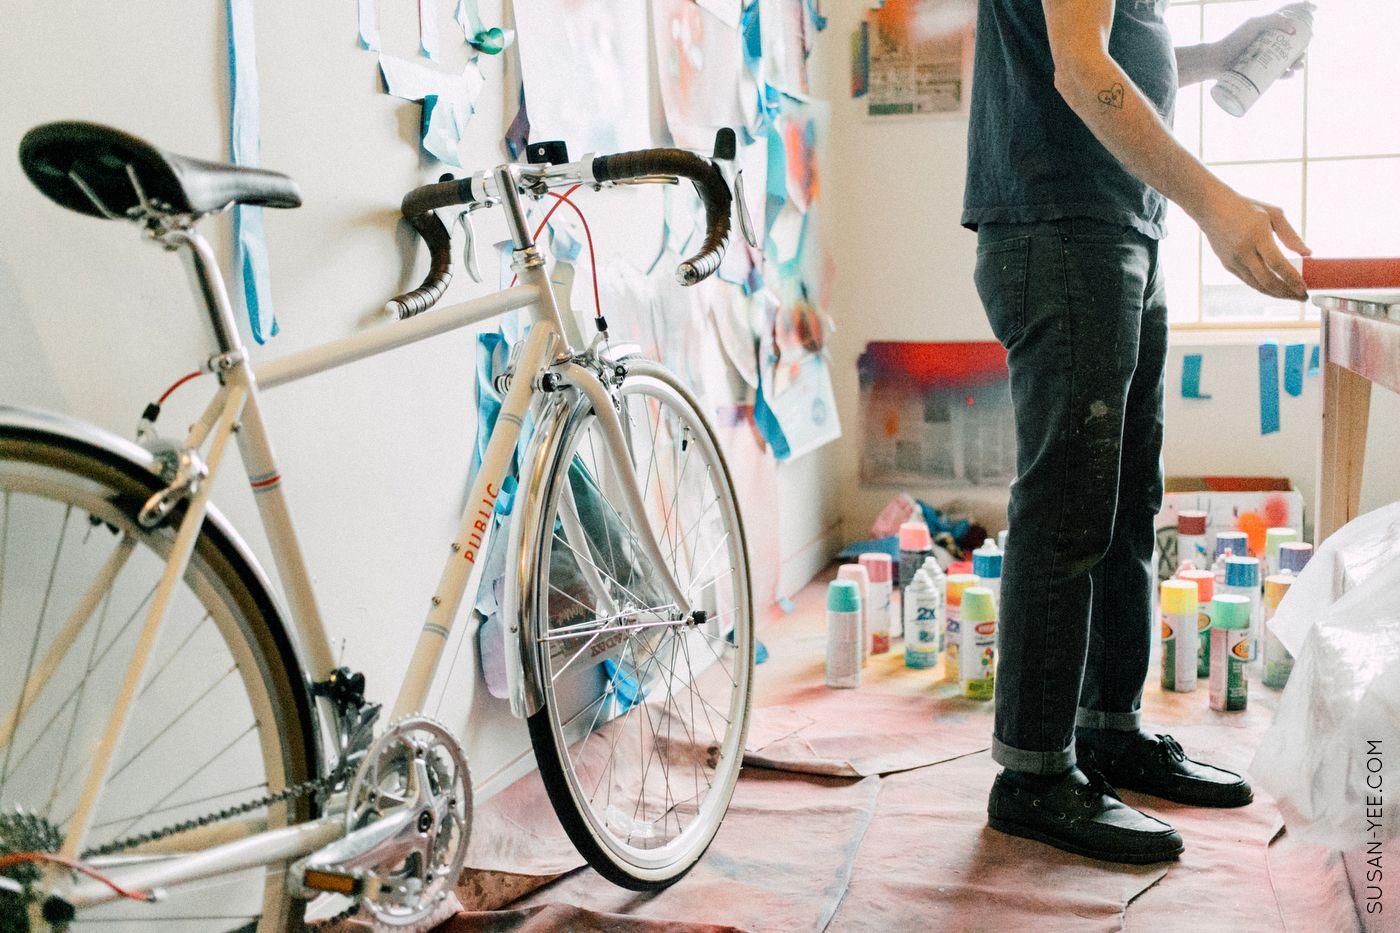 Public Bike Stories | Artist Jose DiGregorio